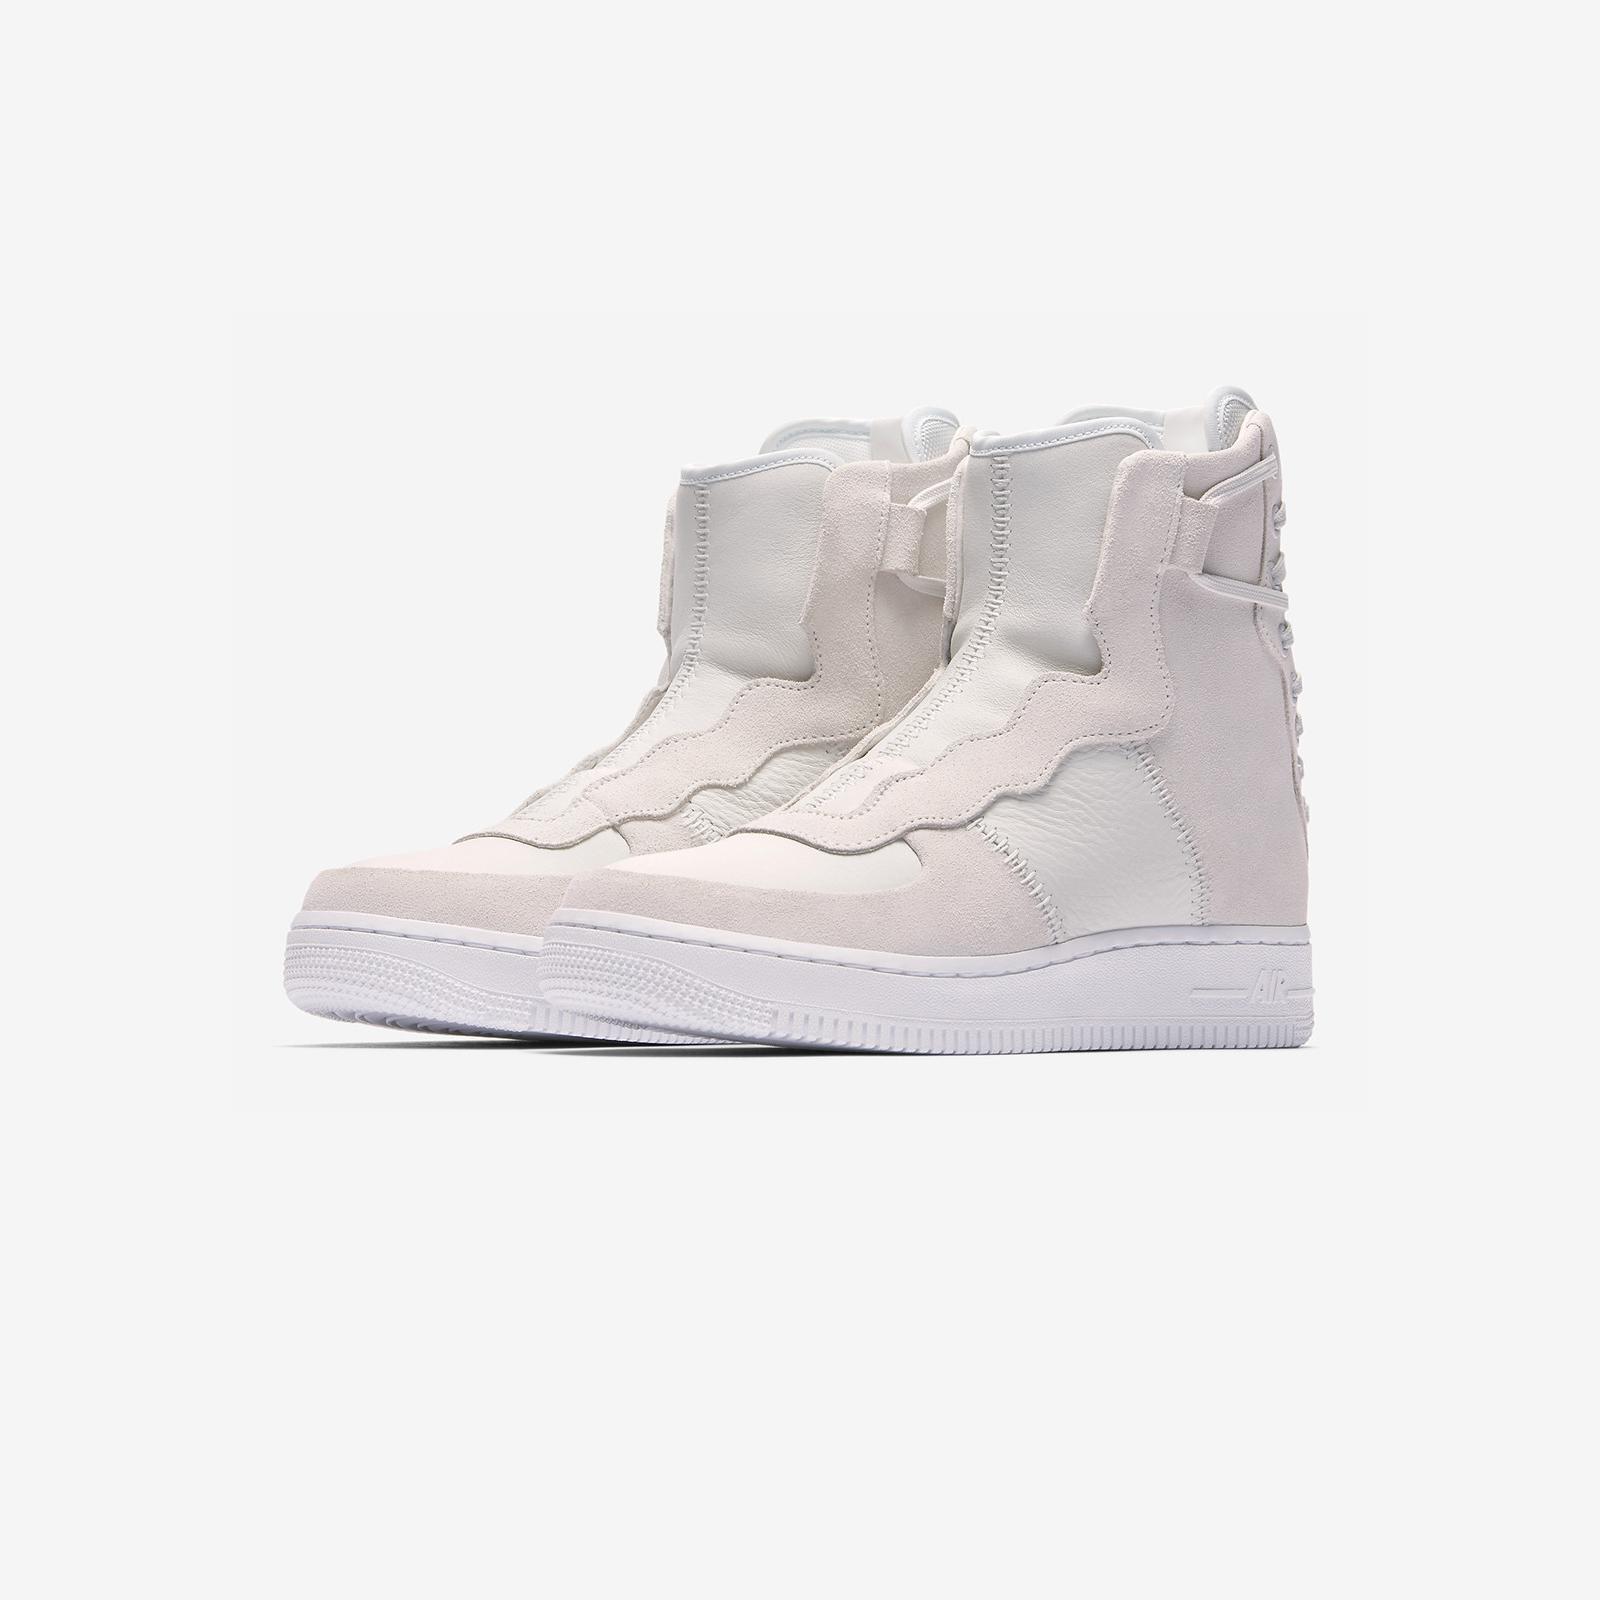 Nike Sportswear Wmns Air Force 1 Rebel XX THE 1 489a80cb4